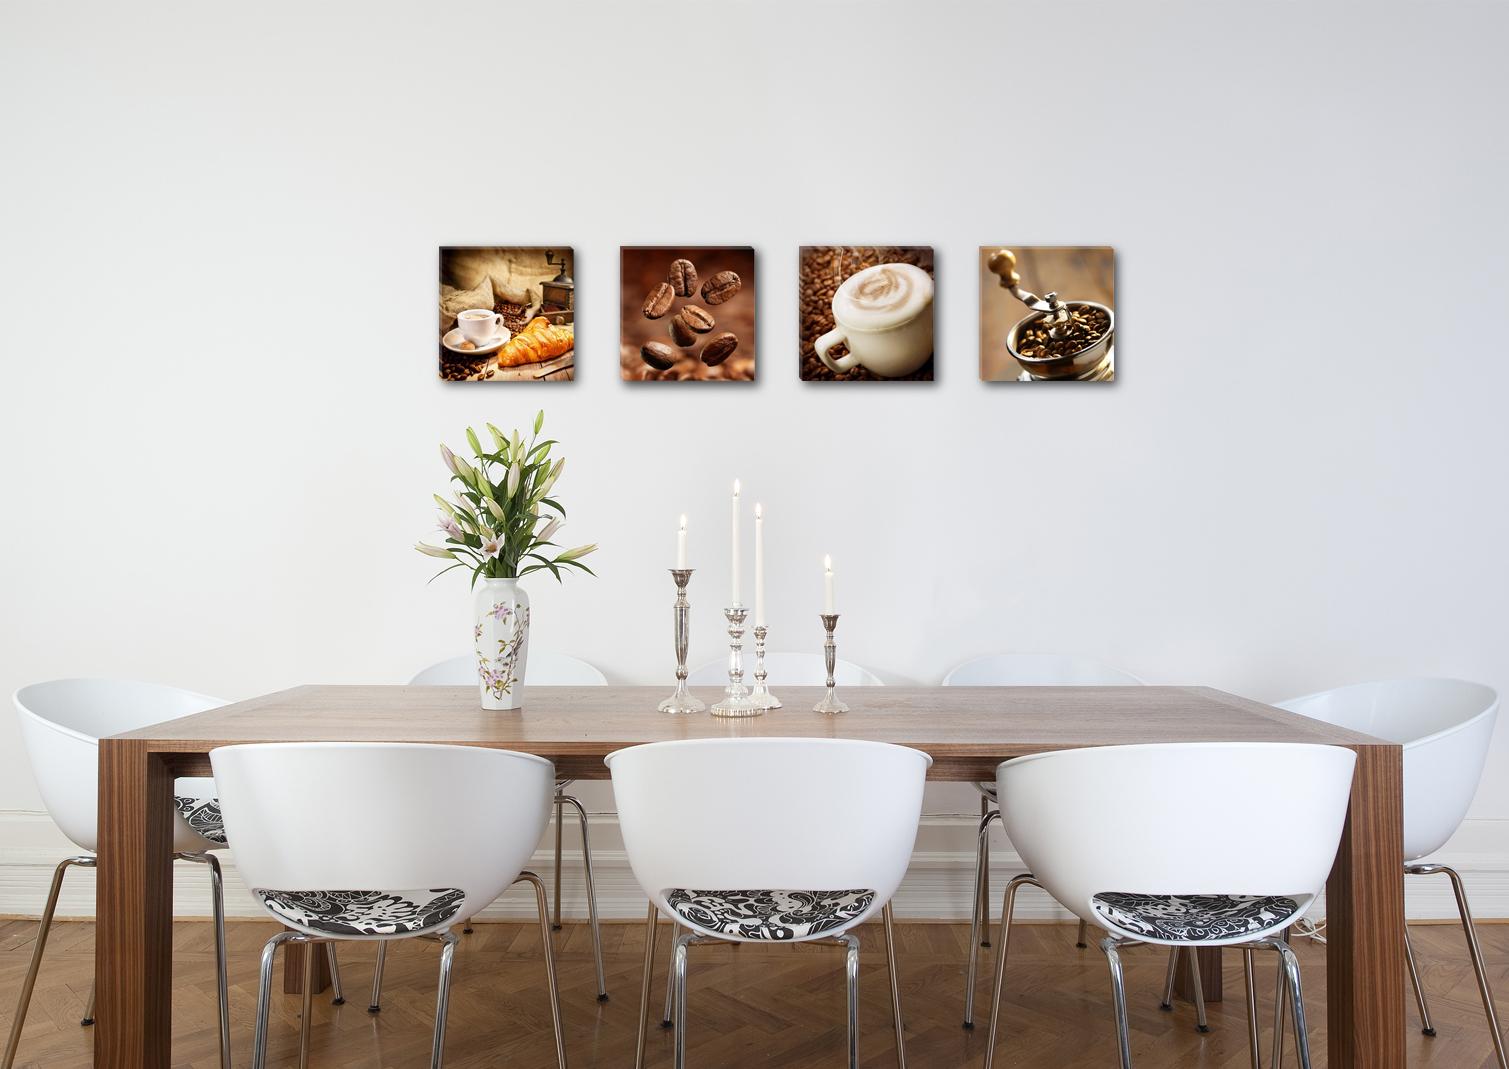 leinwandbilder modern k che kaffee tropfen 4x 30x30cm 6603. Black Bedroom Furniture Sets. Home Design Ideas